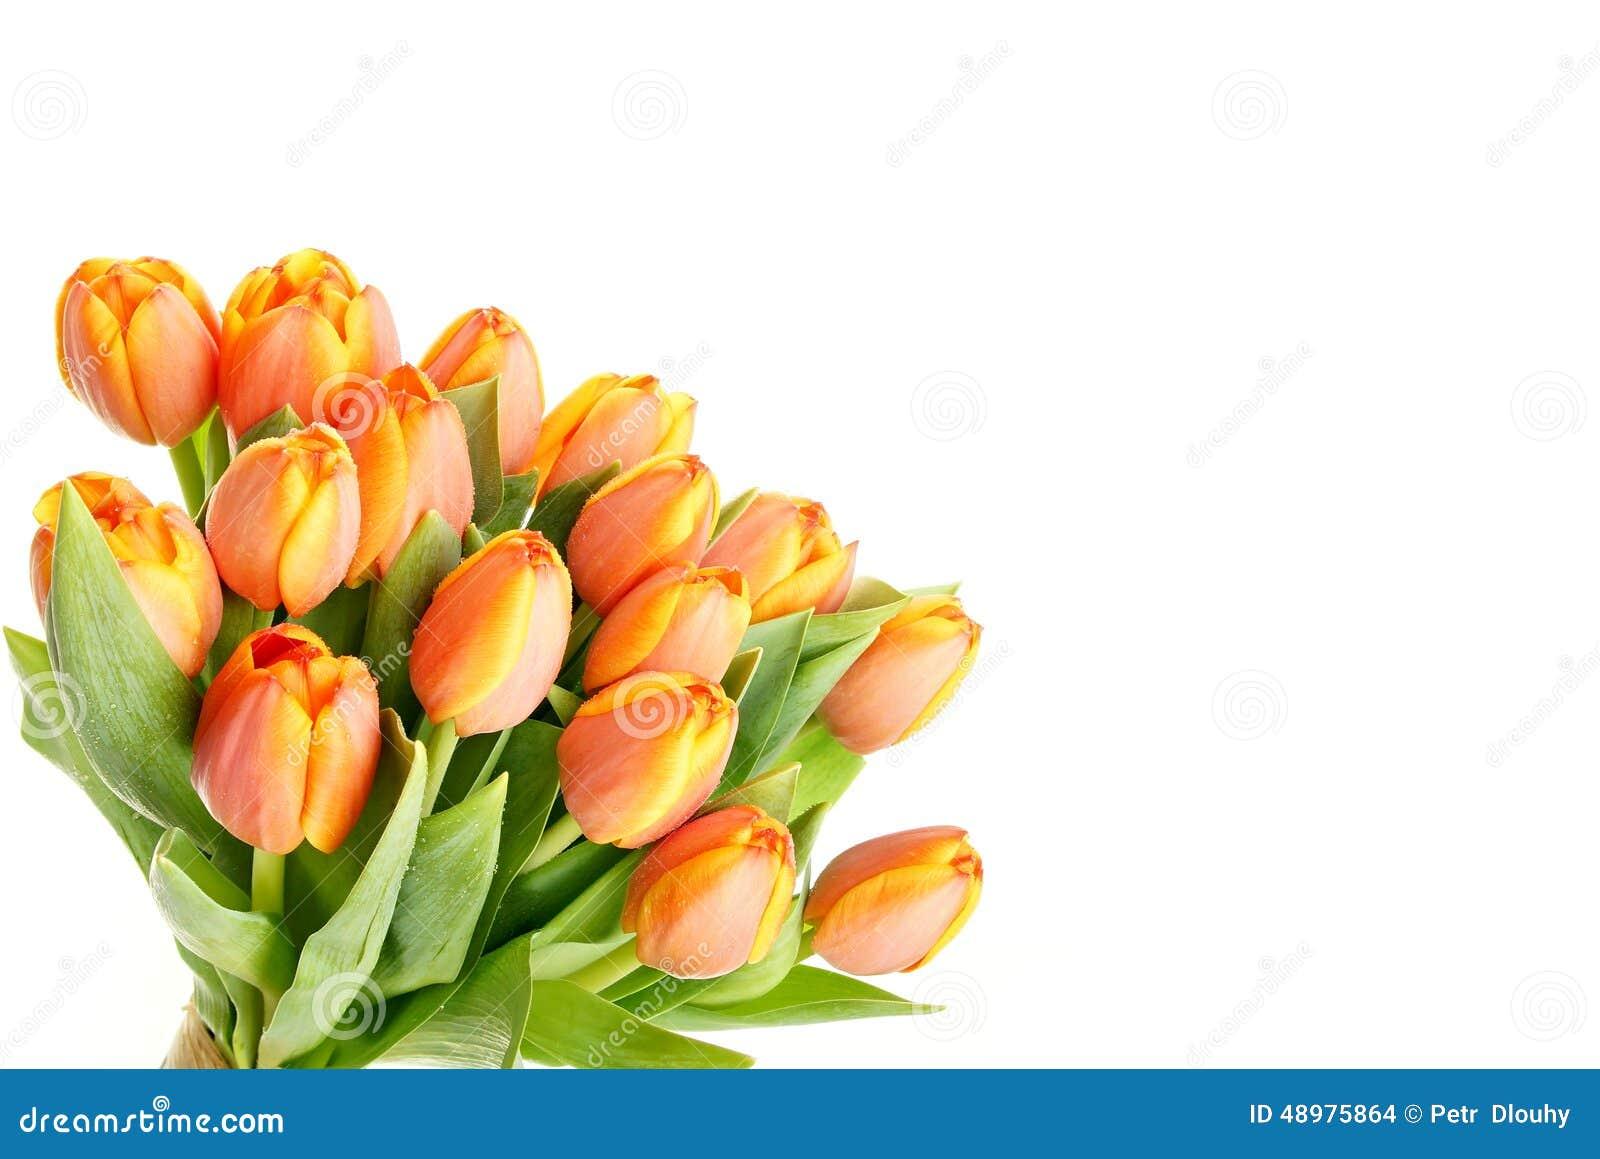 Beautiful Flowers Tulip Stock Photo Image Of Fragrance 48975864